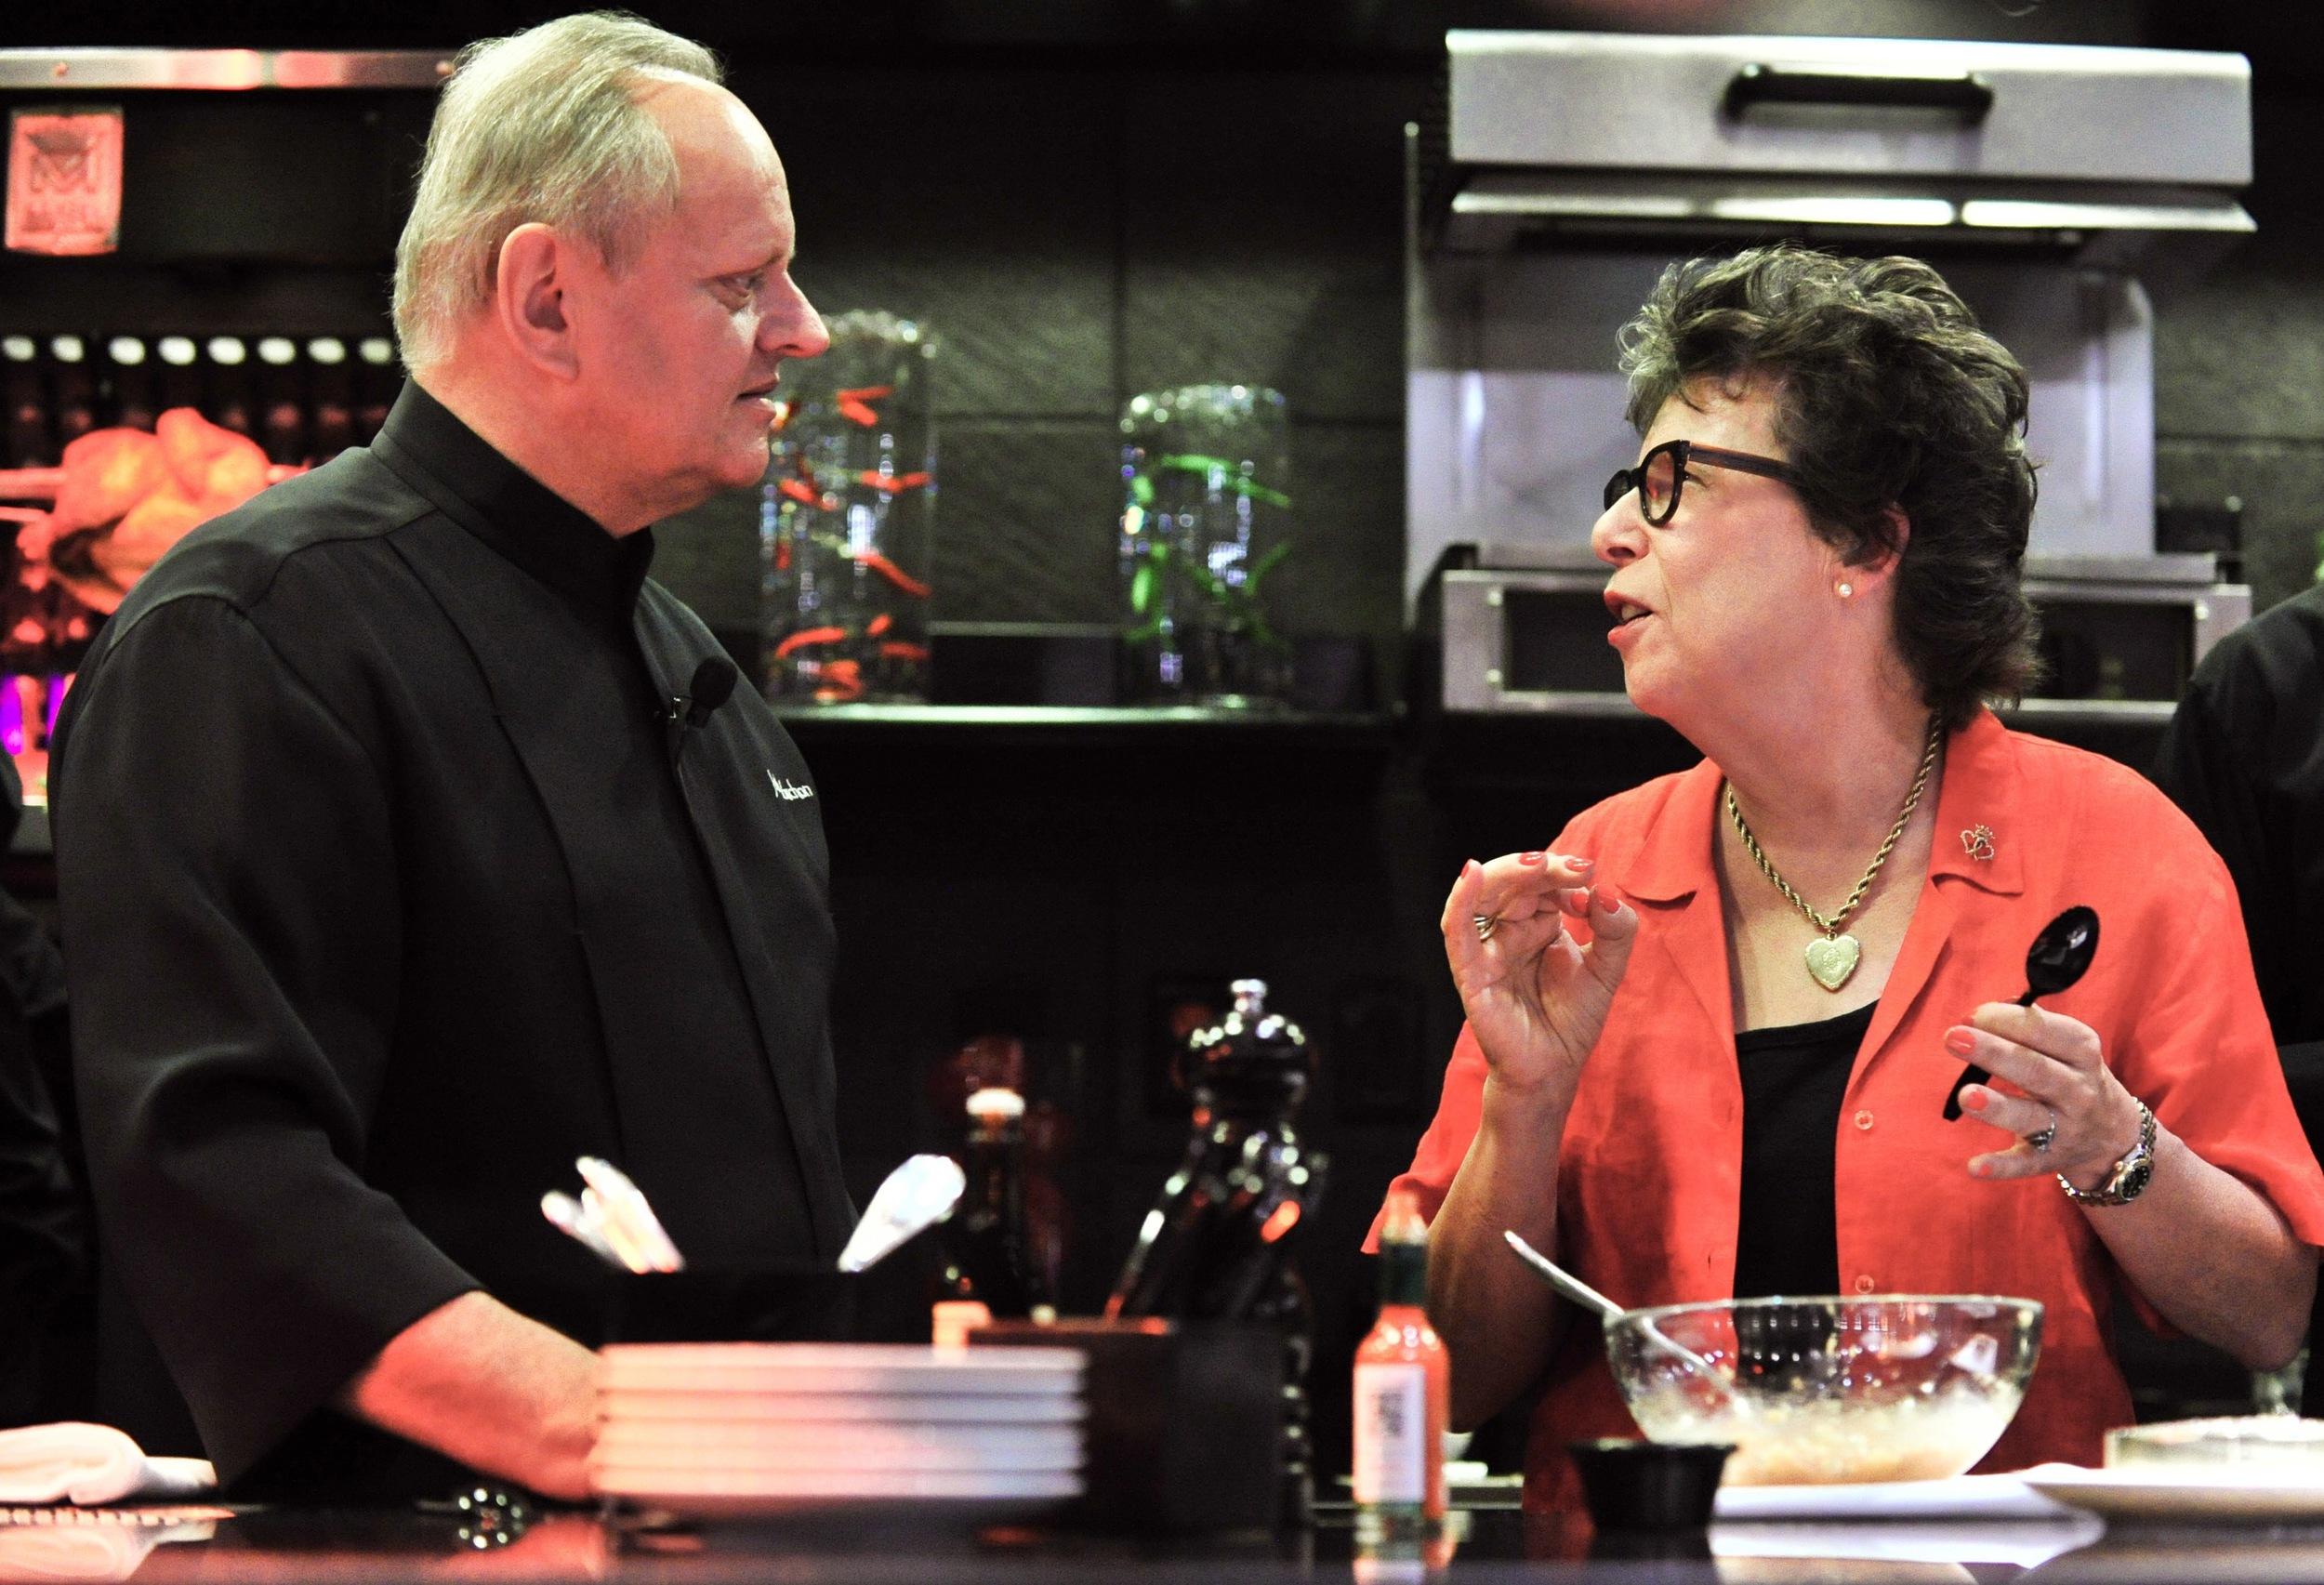 Alice M. Hart & Chef Joel Robuchon